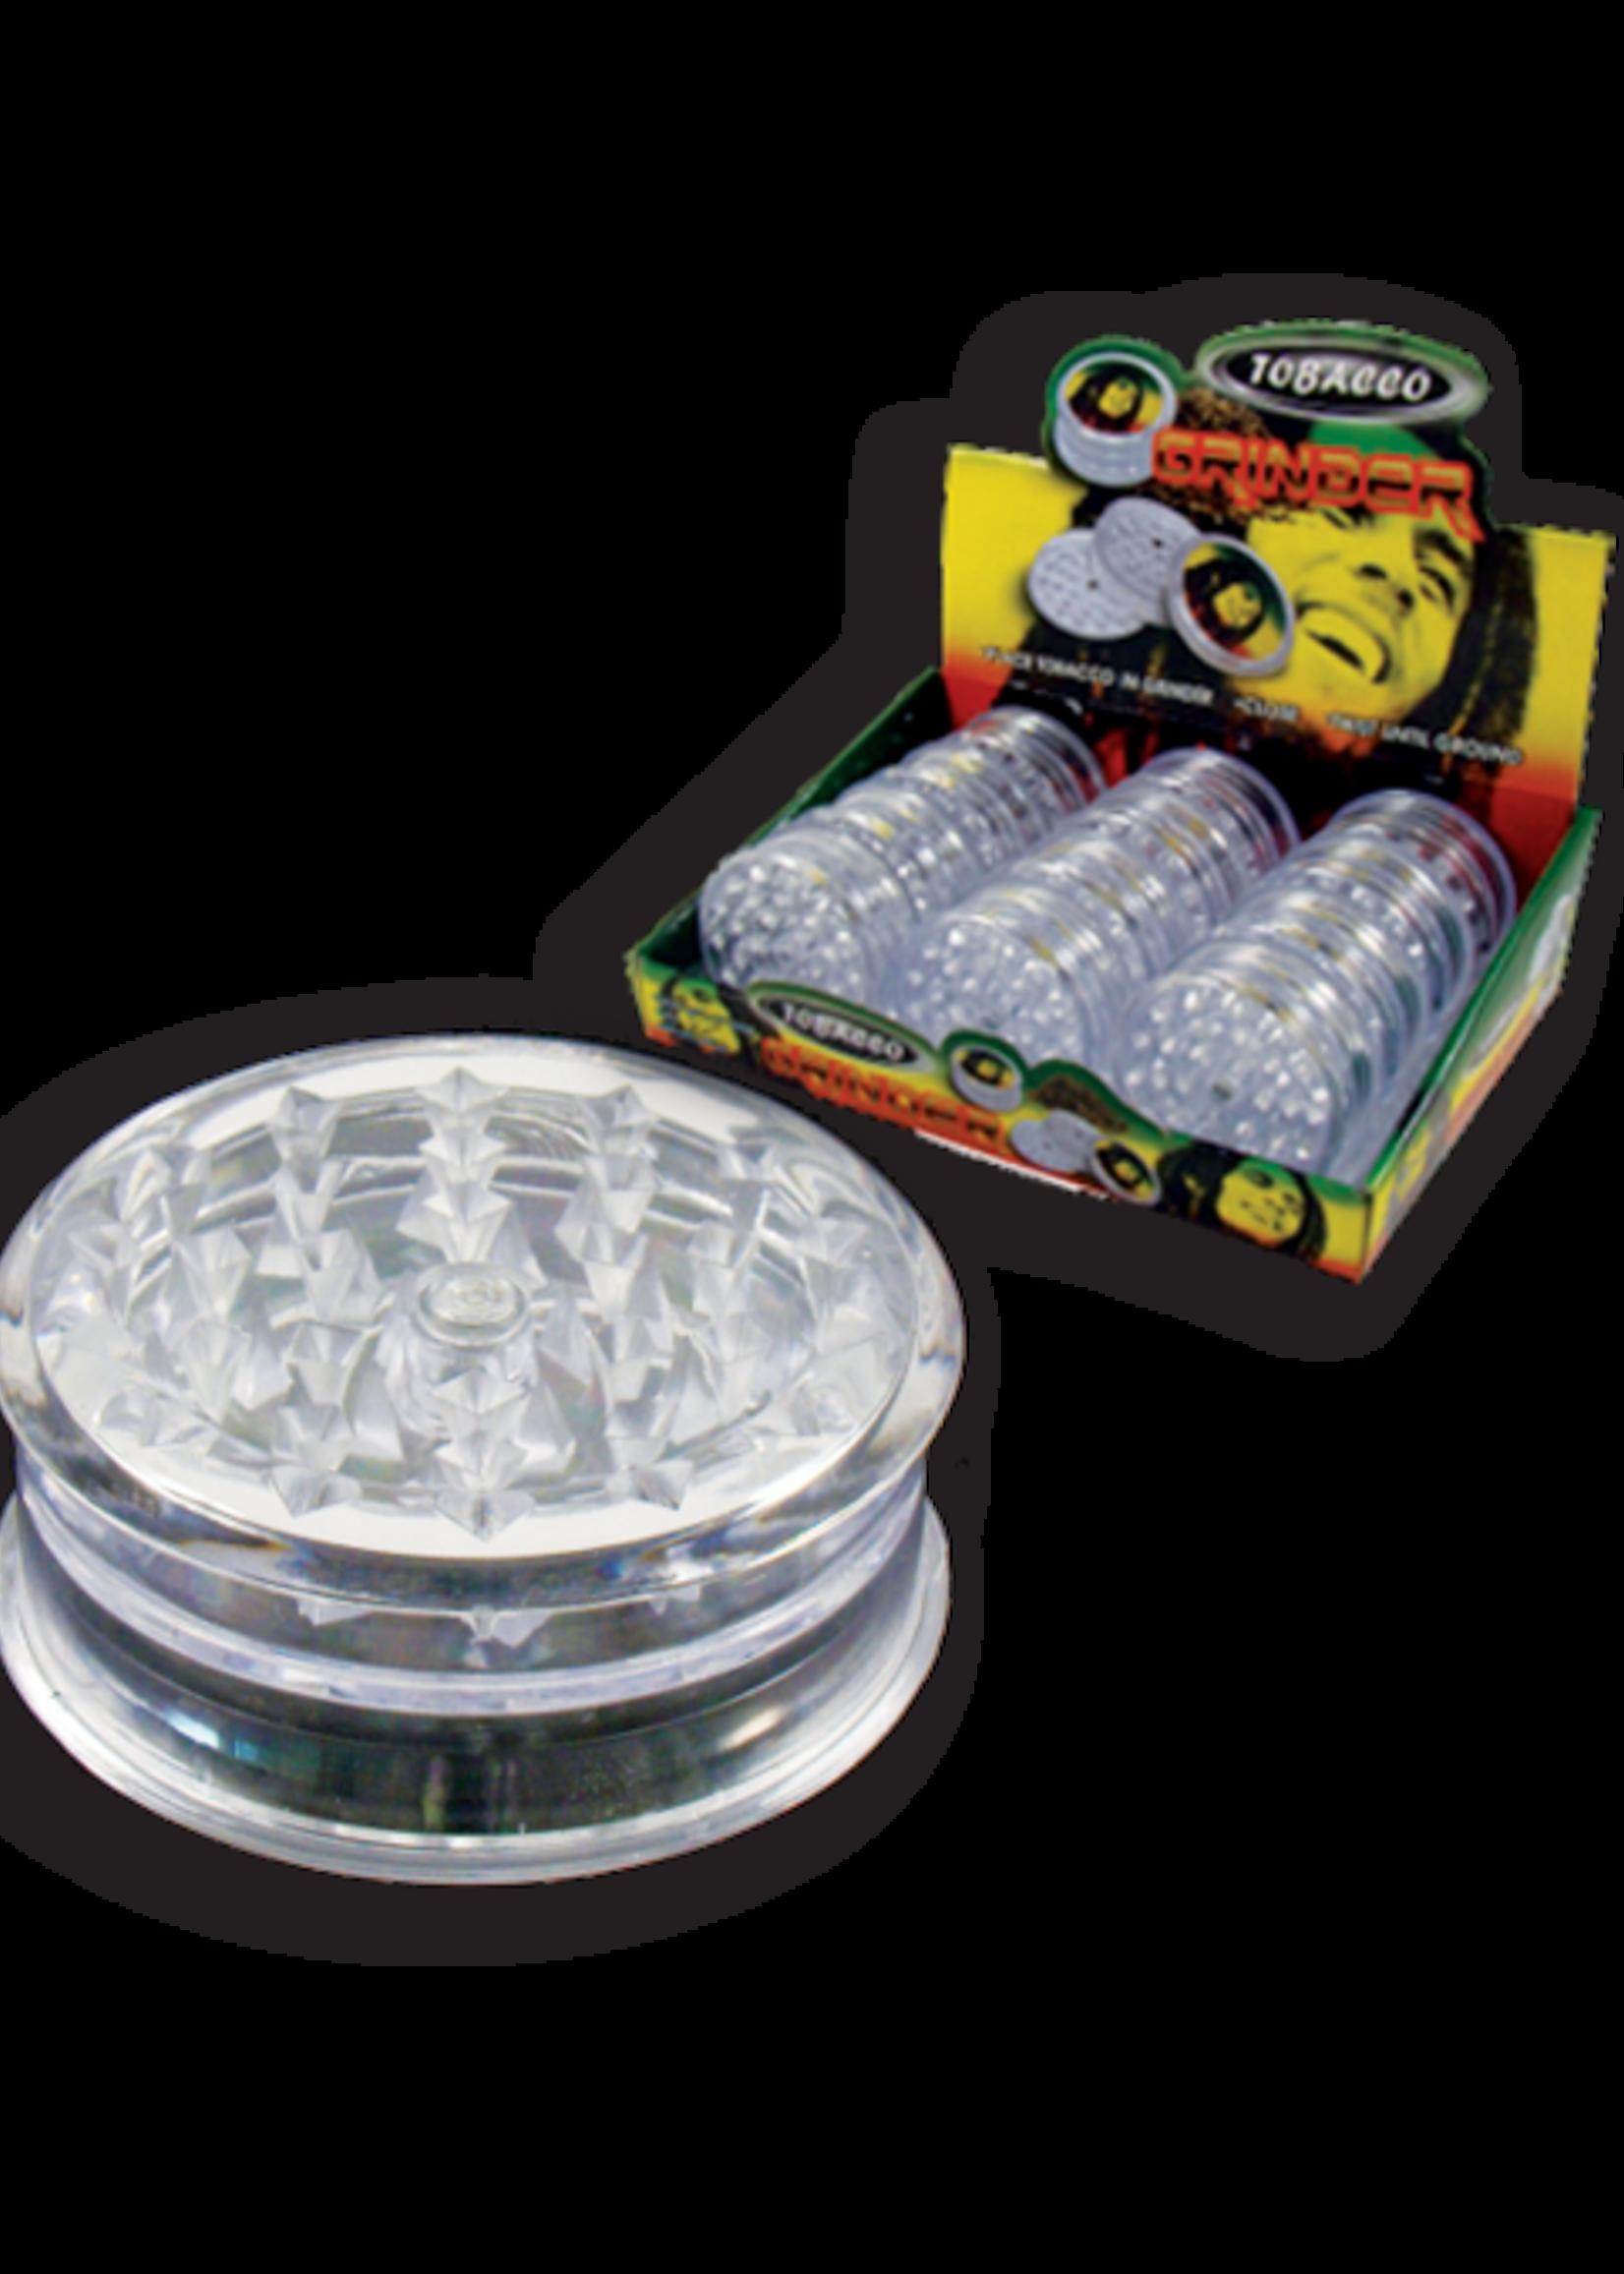 Herb grinder - Clear plastic